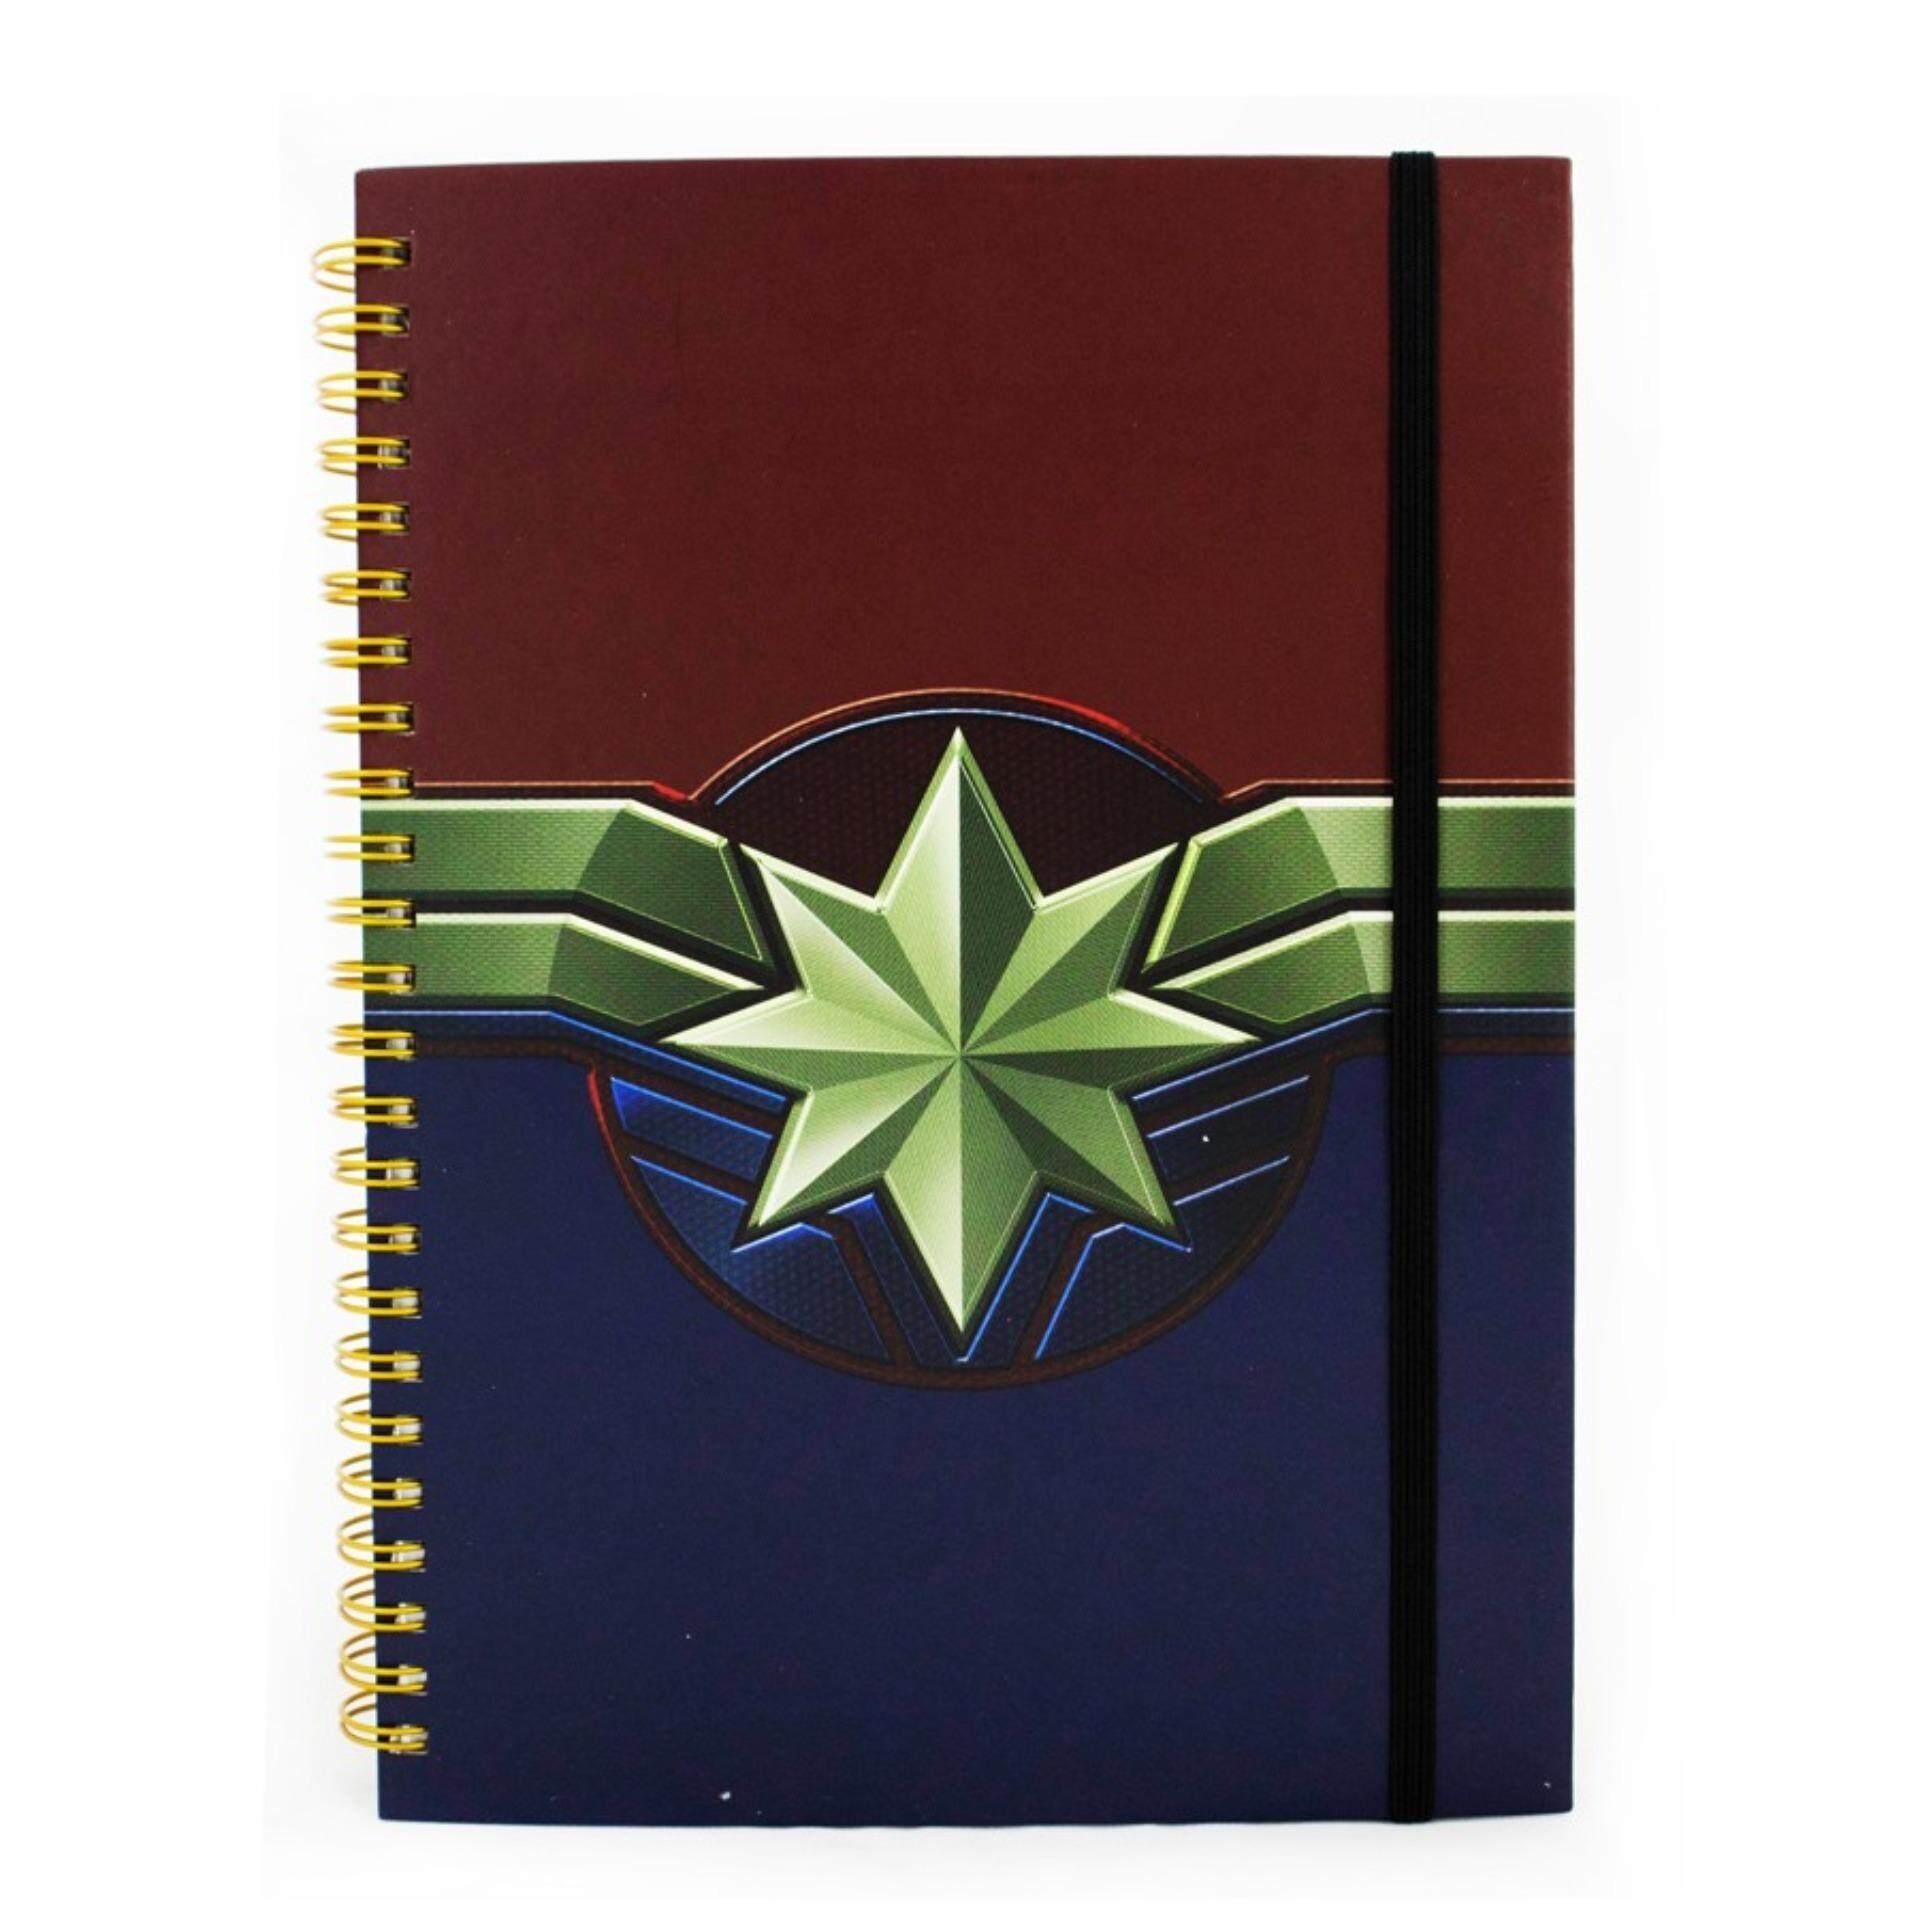 Marvel Avengers 100 Sheets A5 Hard Cover Notebook - Captain Marvel